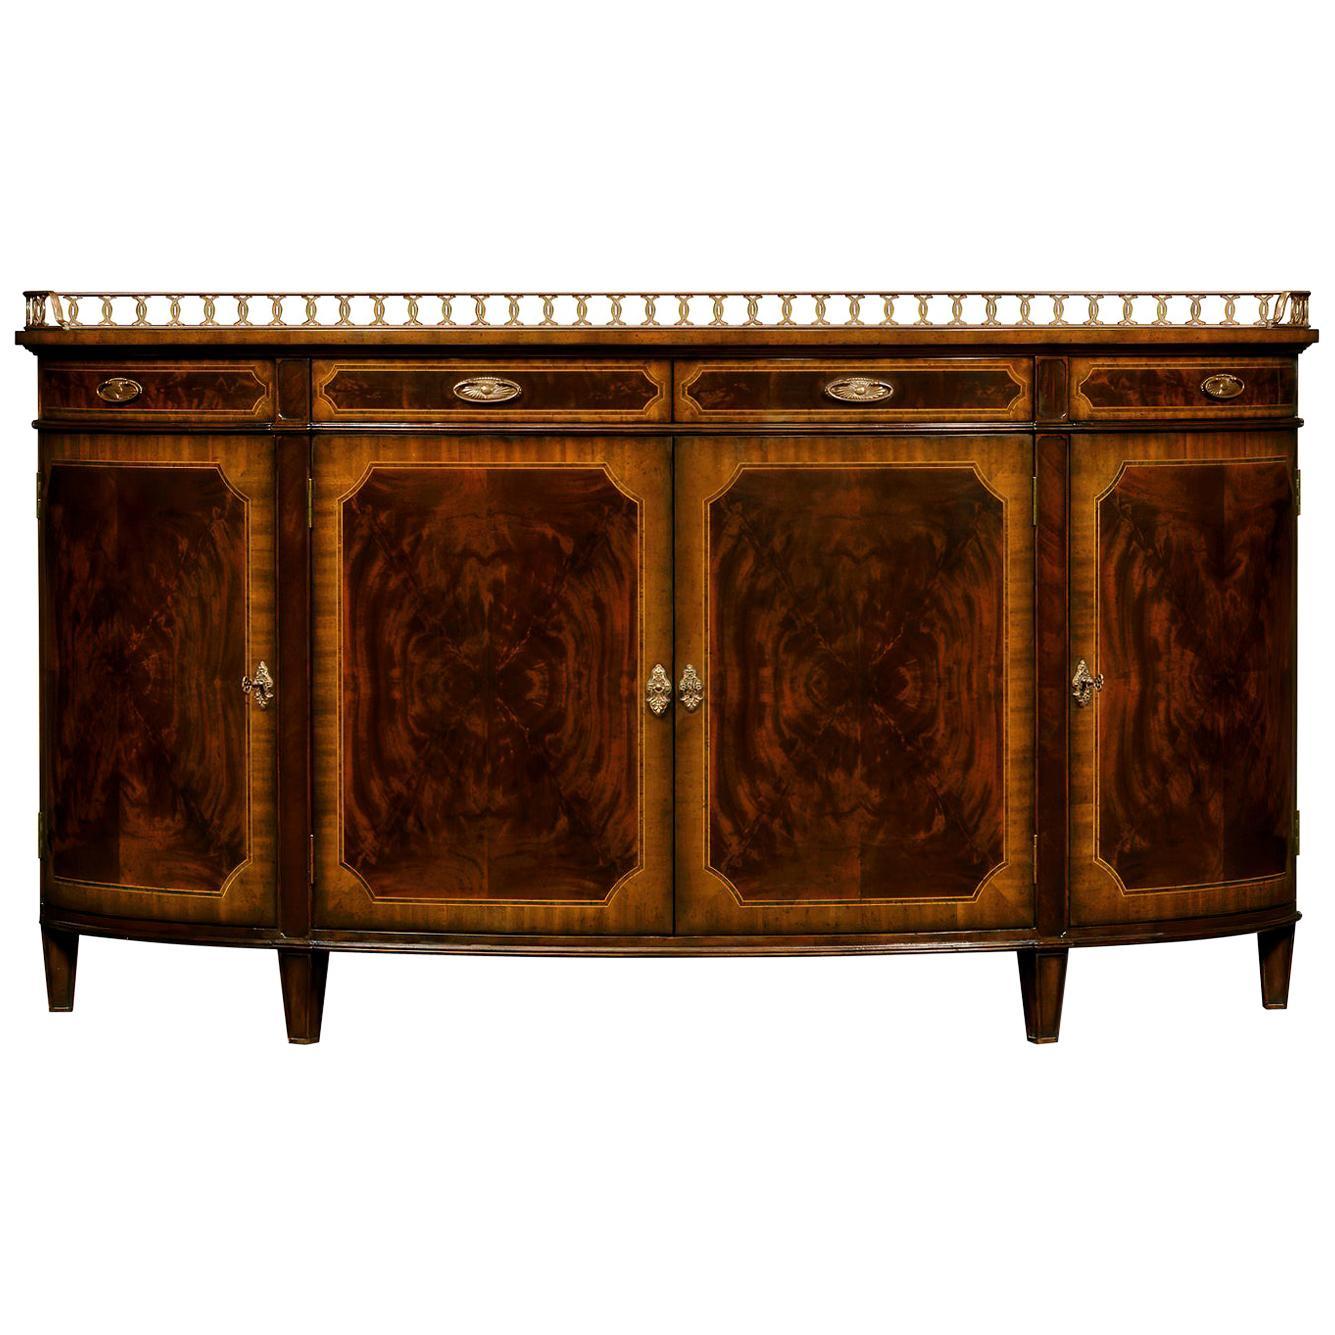 George III Demilune Sideboard